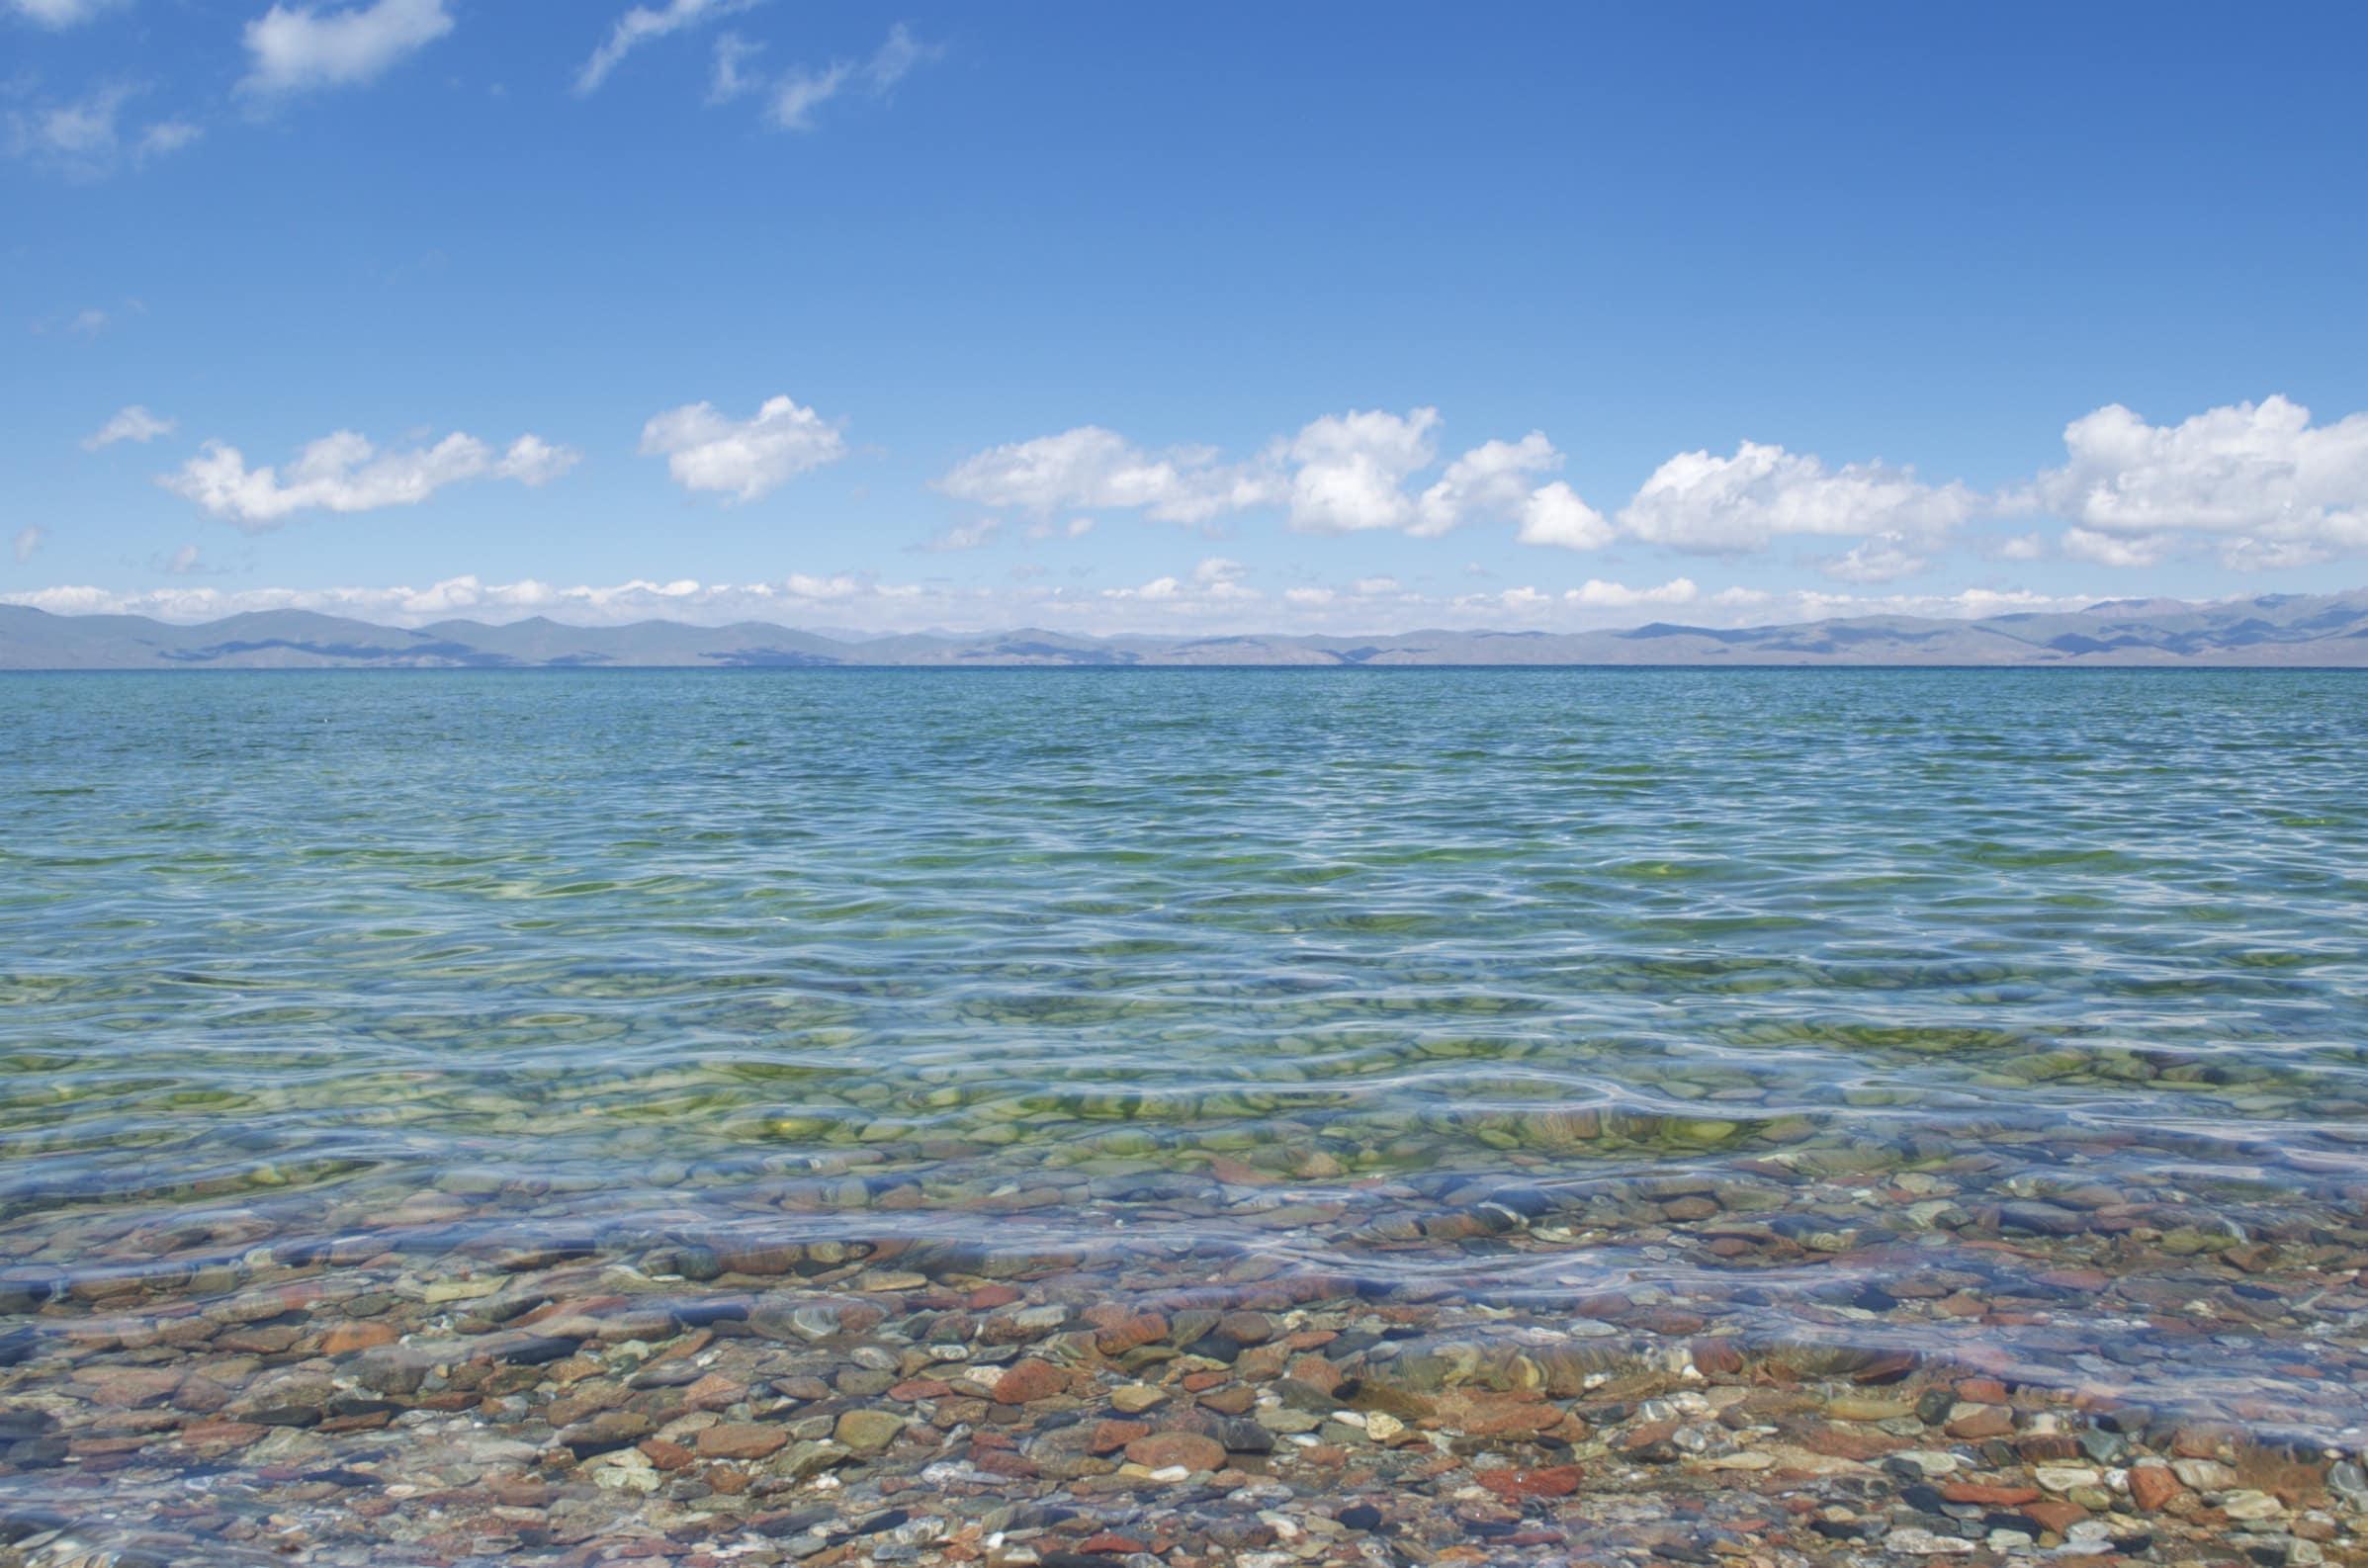 kristallklares Wasser am Songköl